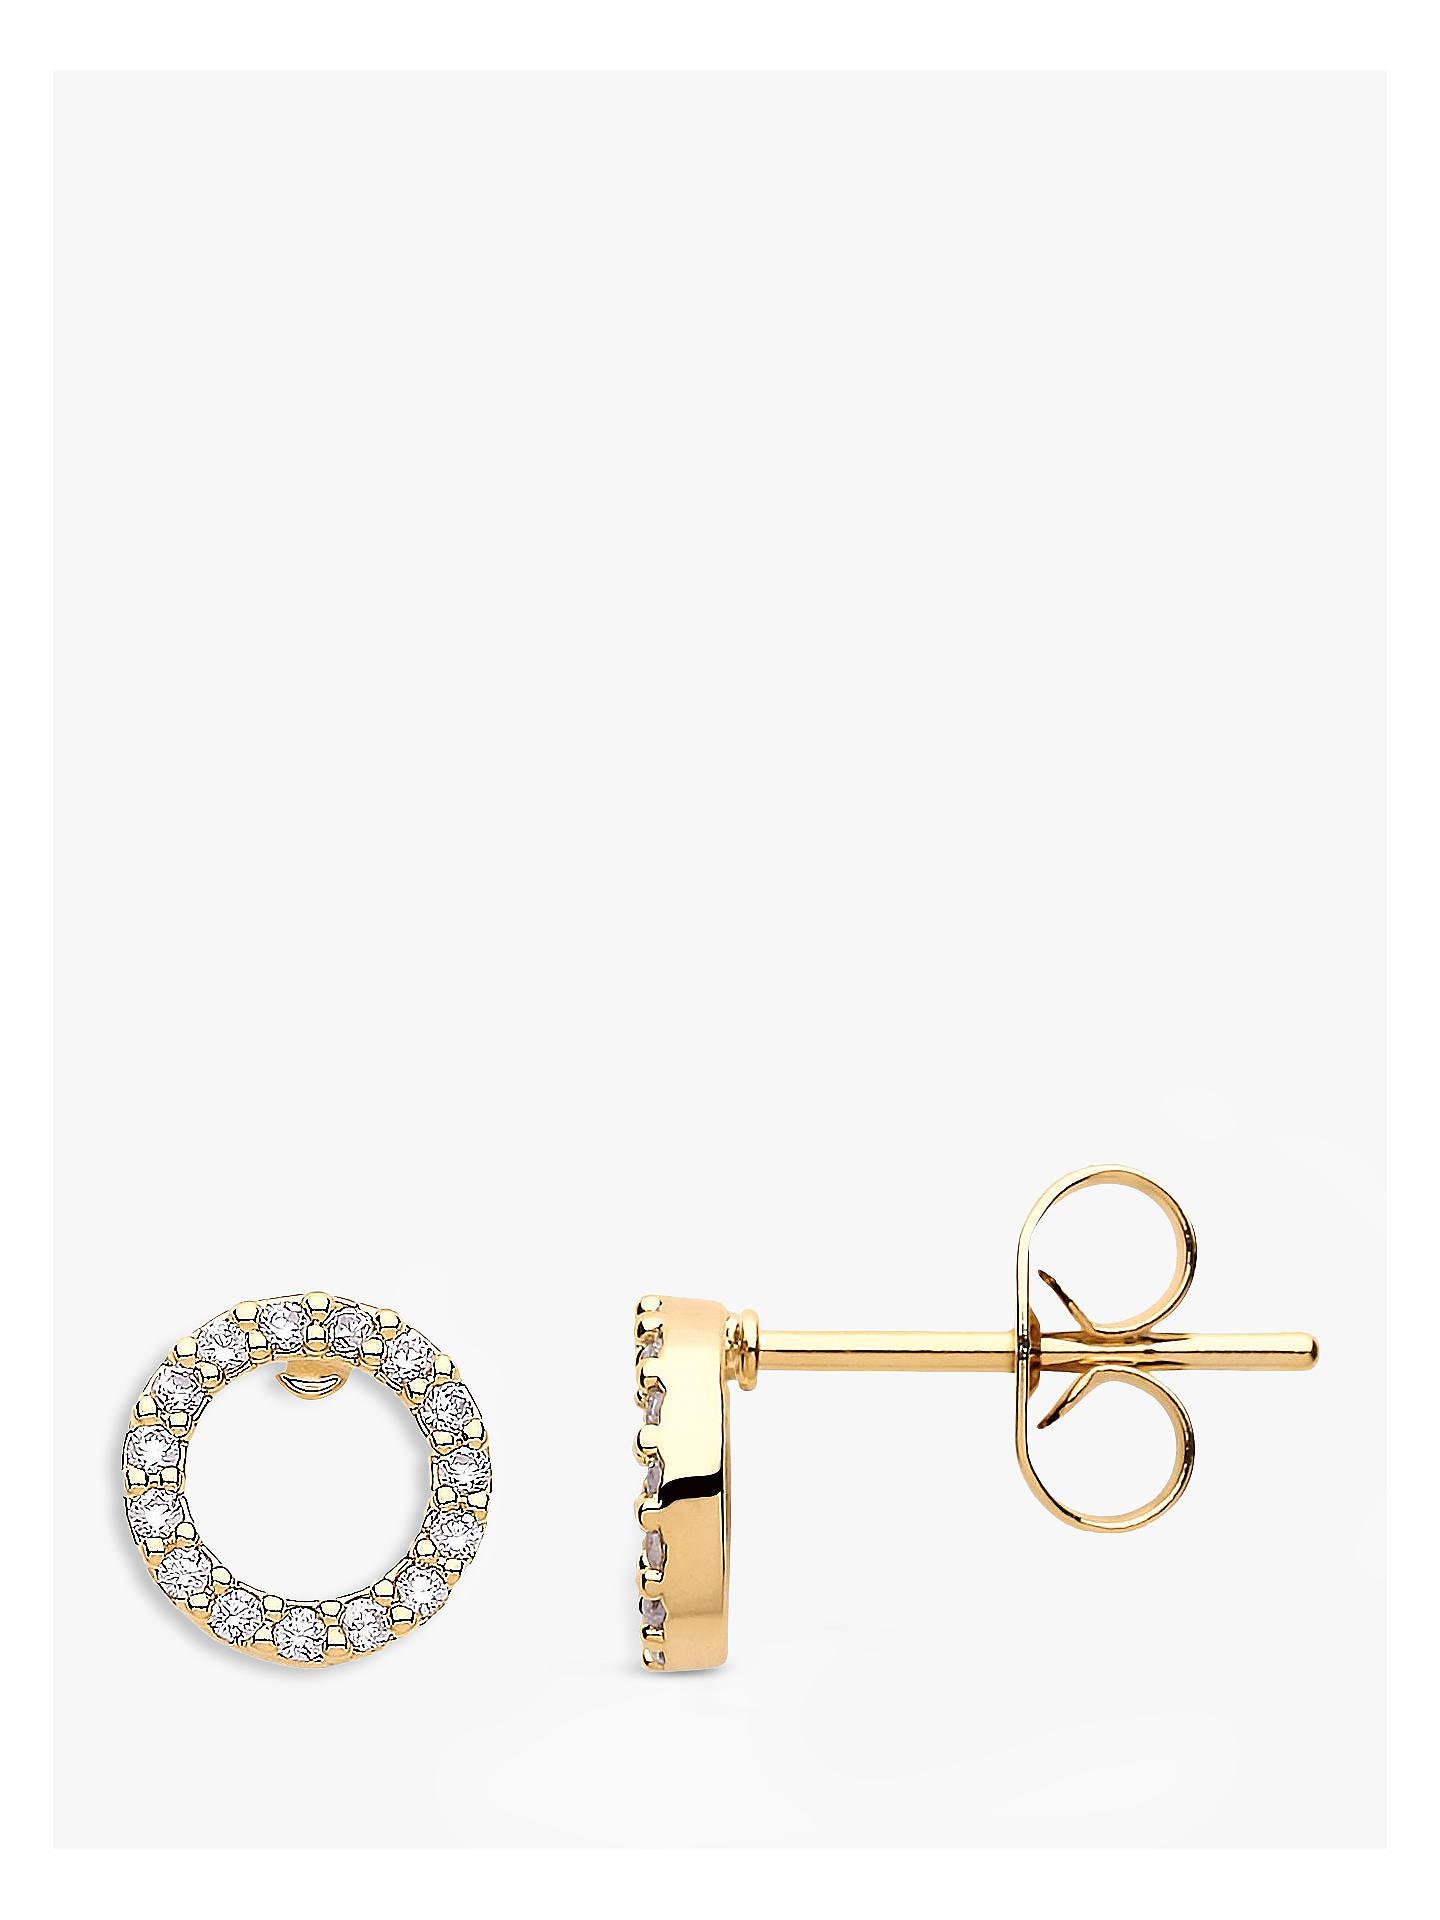 3c2f0b853488 Buy Estella Bartlett Cubic Zirconia Open Circle Stud Earrings, Gold Online  at johnlewis.com